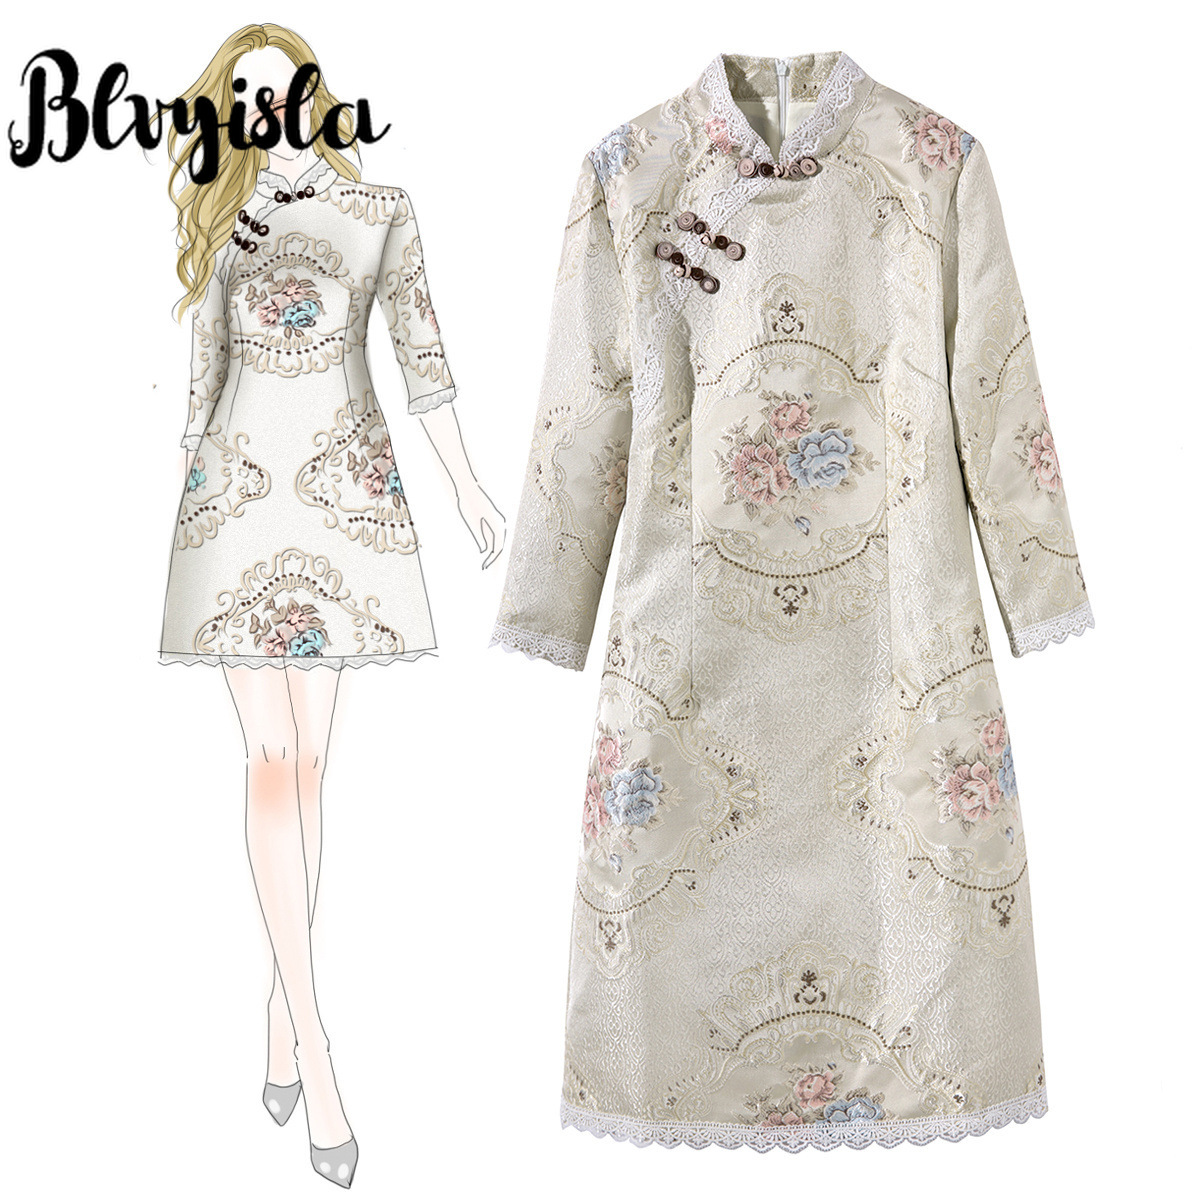 Blvyisla rétro Mini Cheongsam Slim femmes Sexy chinois Jacquard broderie robe chine qipao robes asie taille